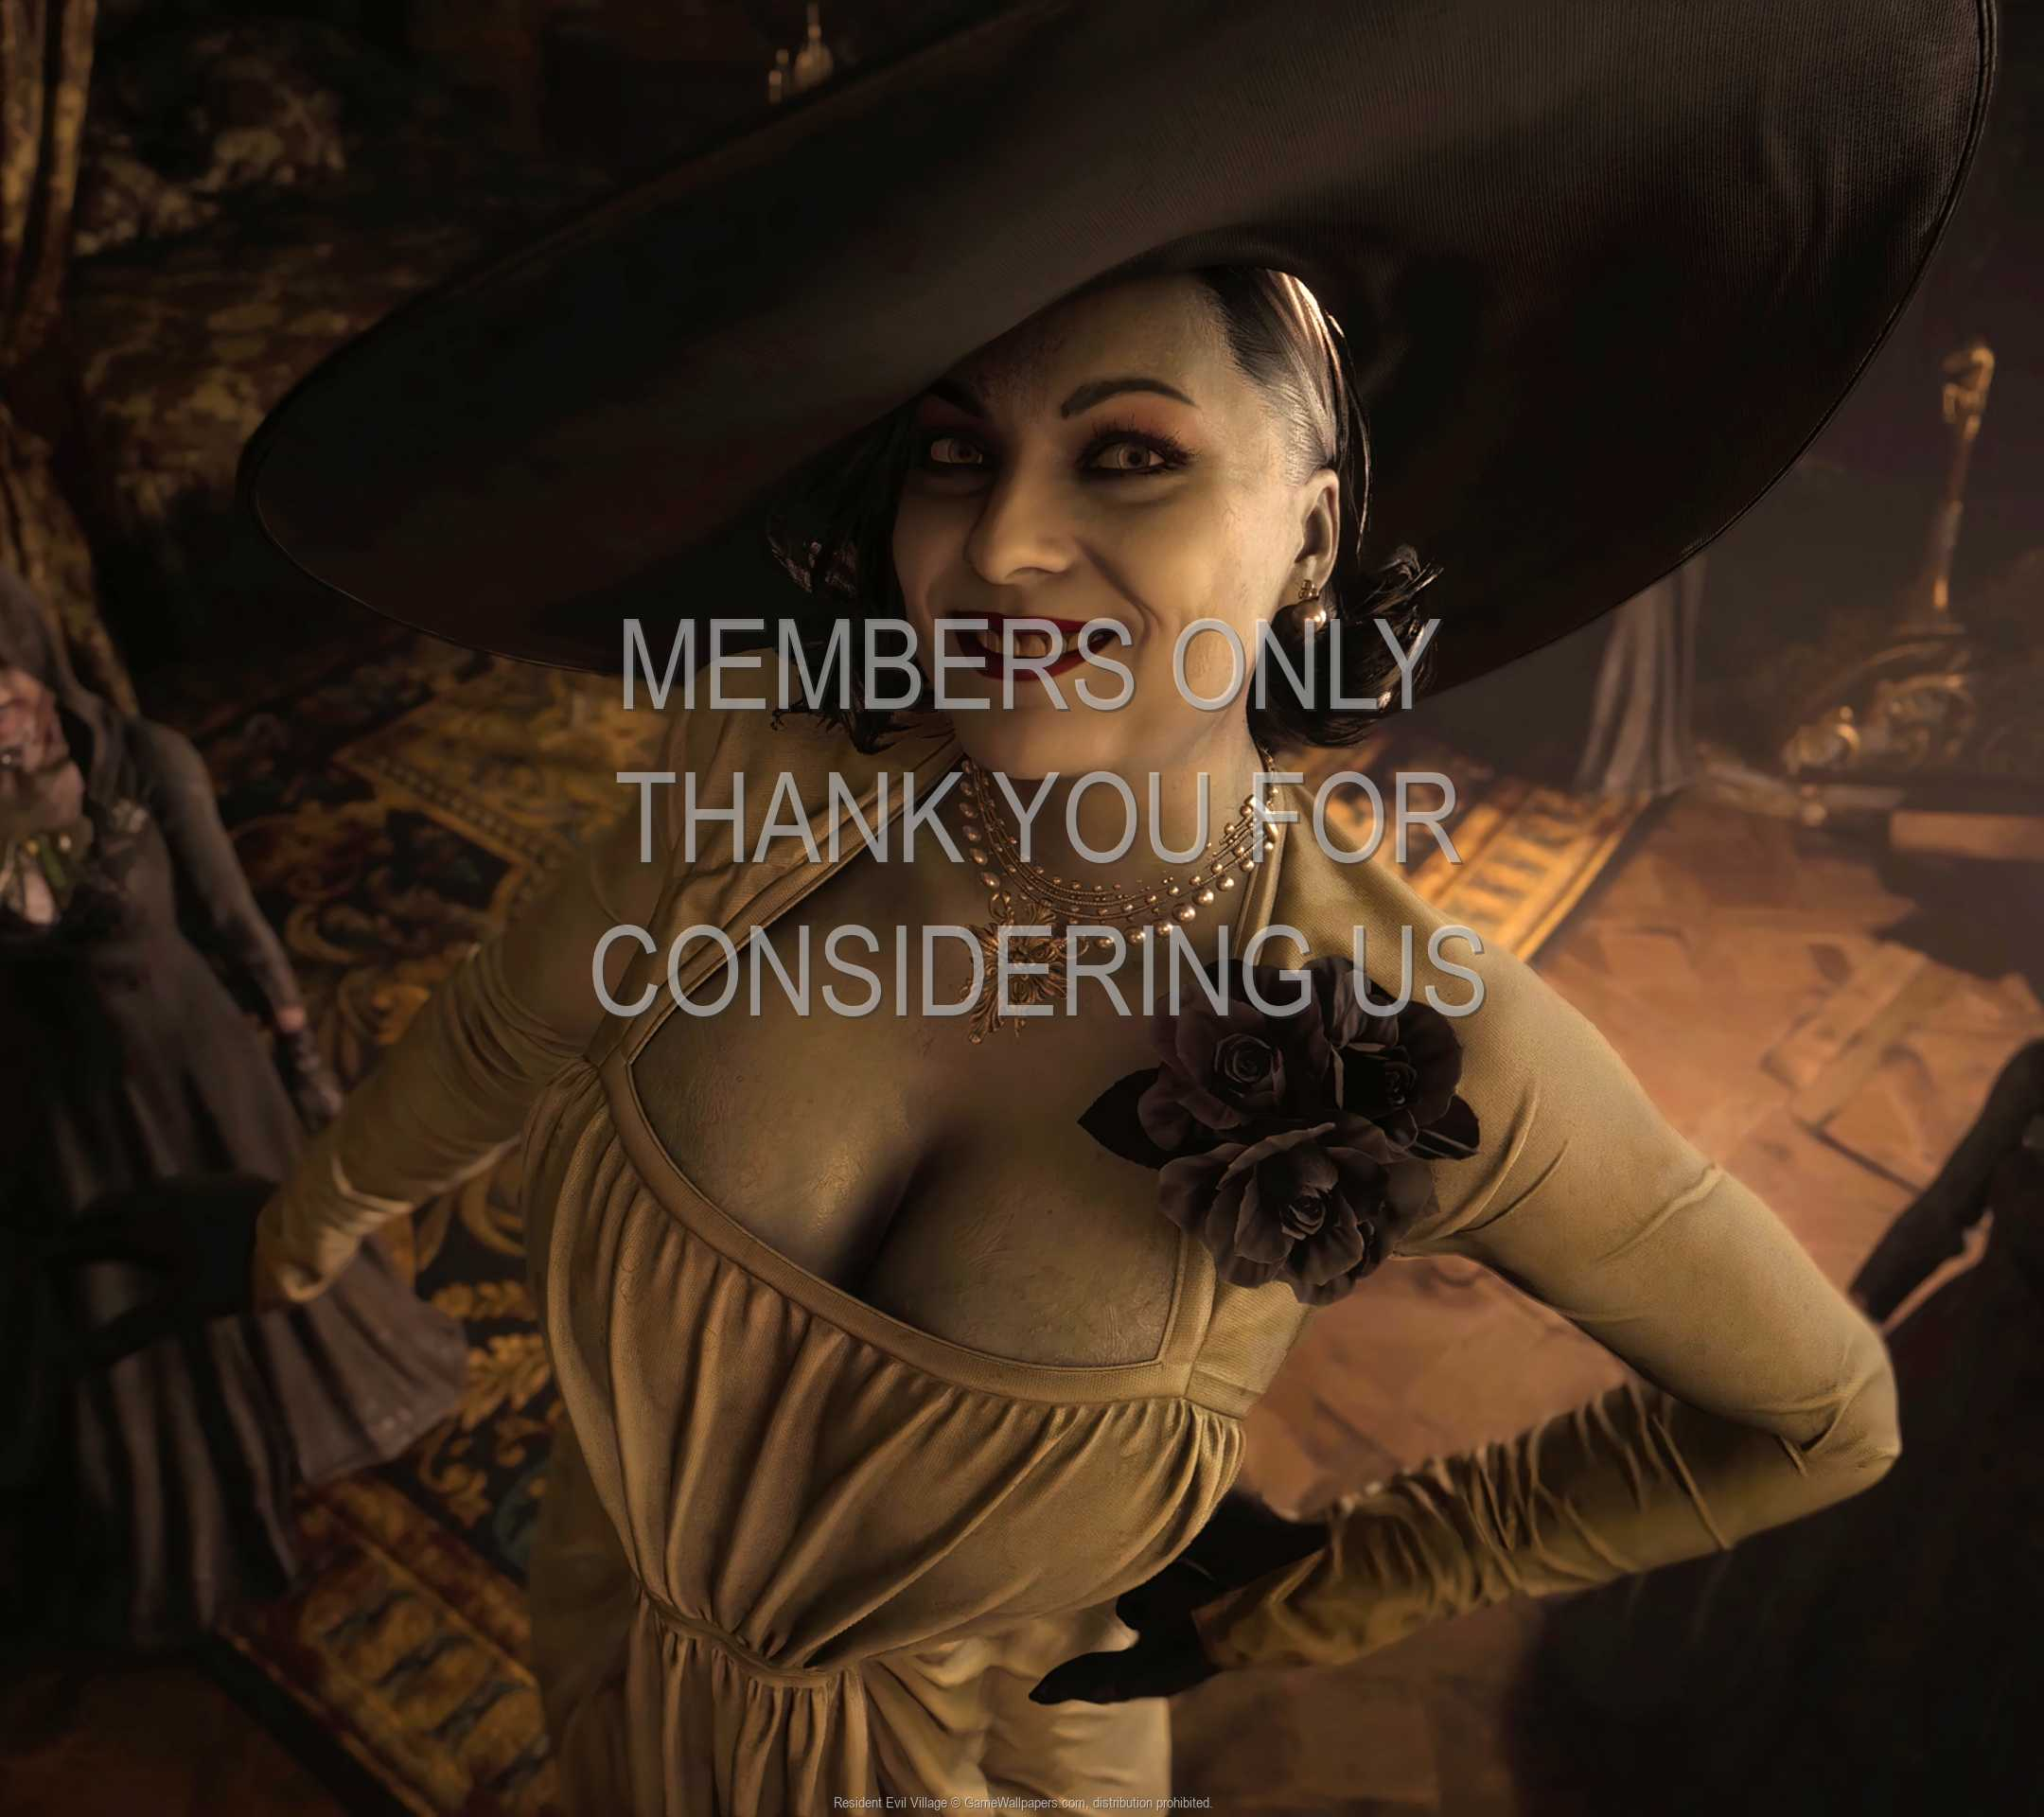 Resident Evil Village 1080p Horizontal Mobile wallpaper or background 05